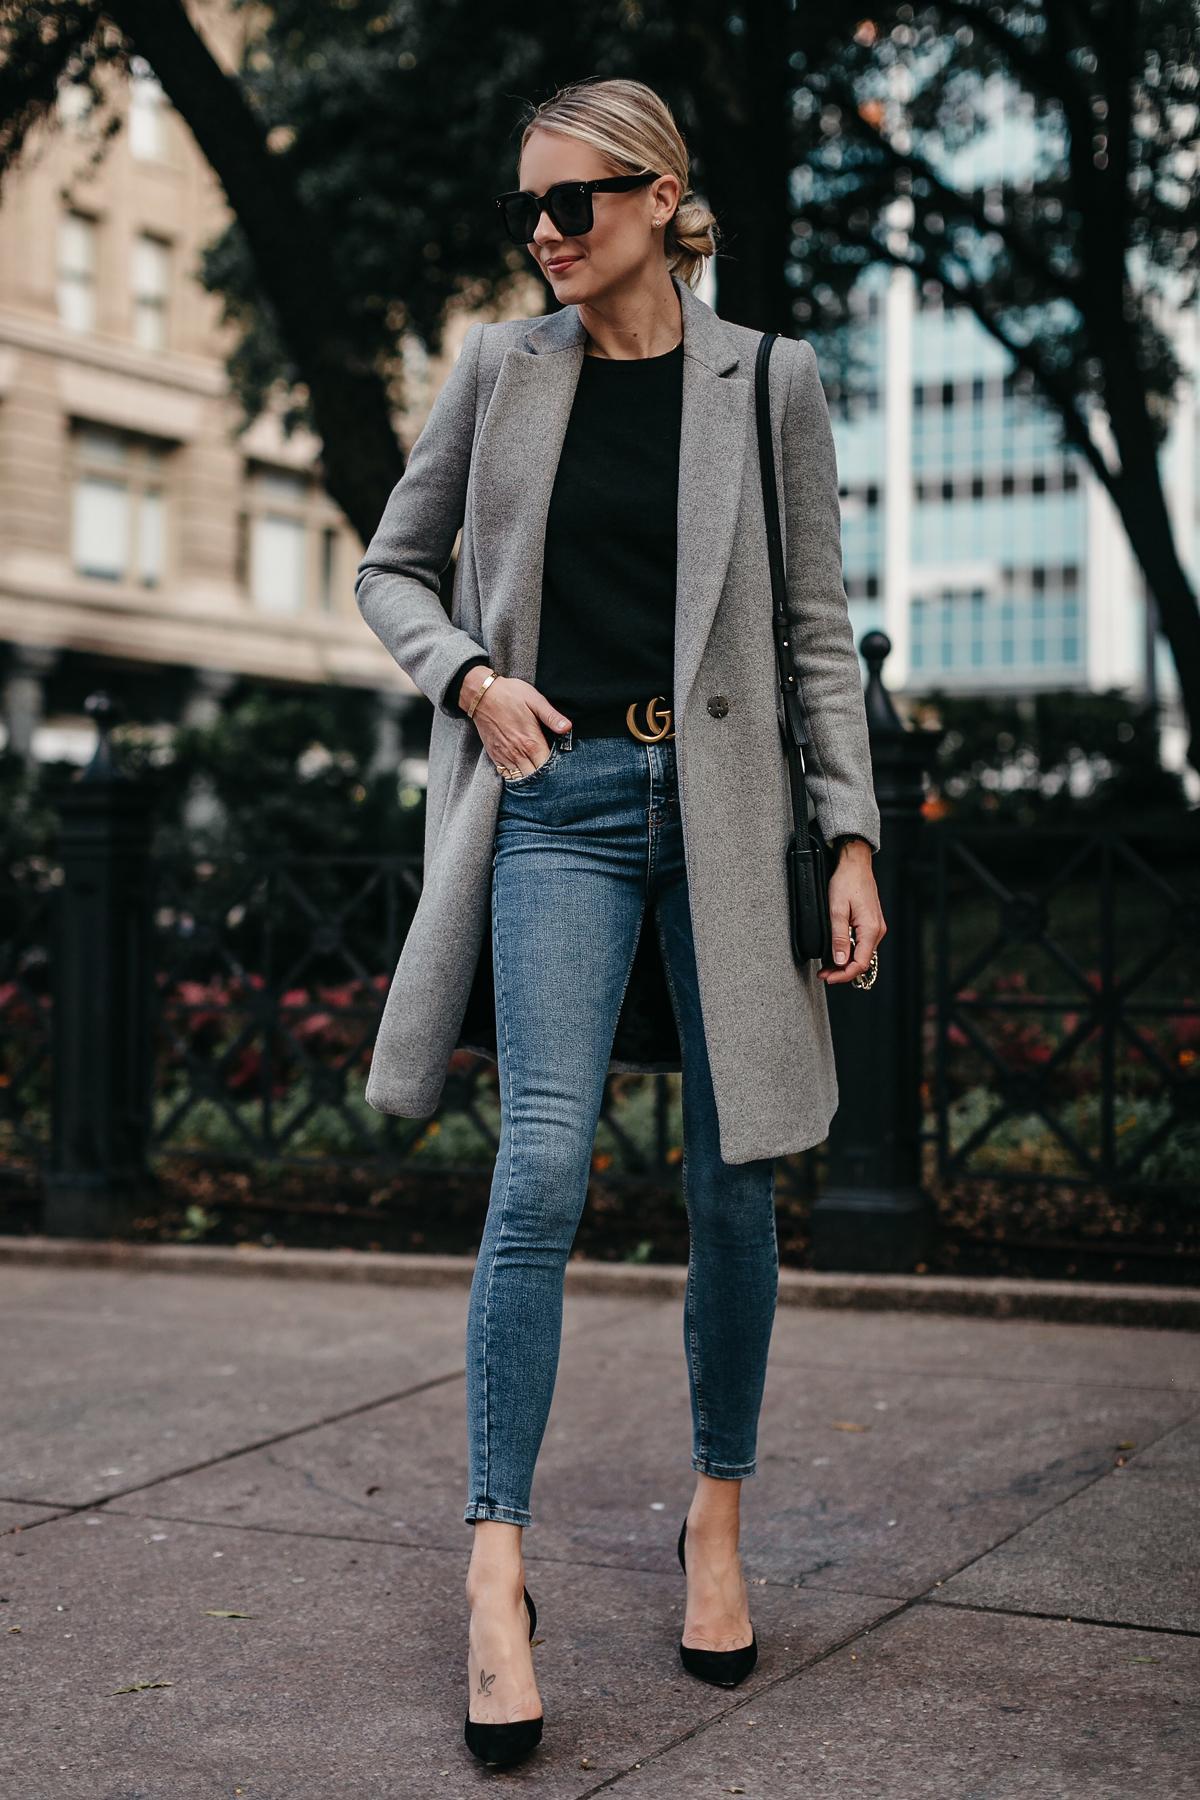 Blonde Woman Wearing Zara Grey Wool Coat Black Sweater Denim Skinny Jeans Gucci Marmont Belt Chrisian Louboutin Black Pumps Fashion Jackson Dallas Blogger Fashion Blogger Street Style